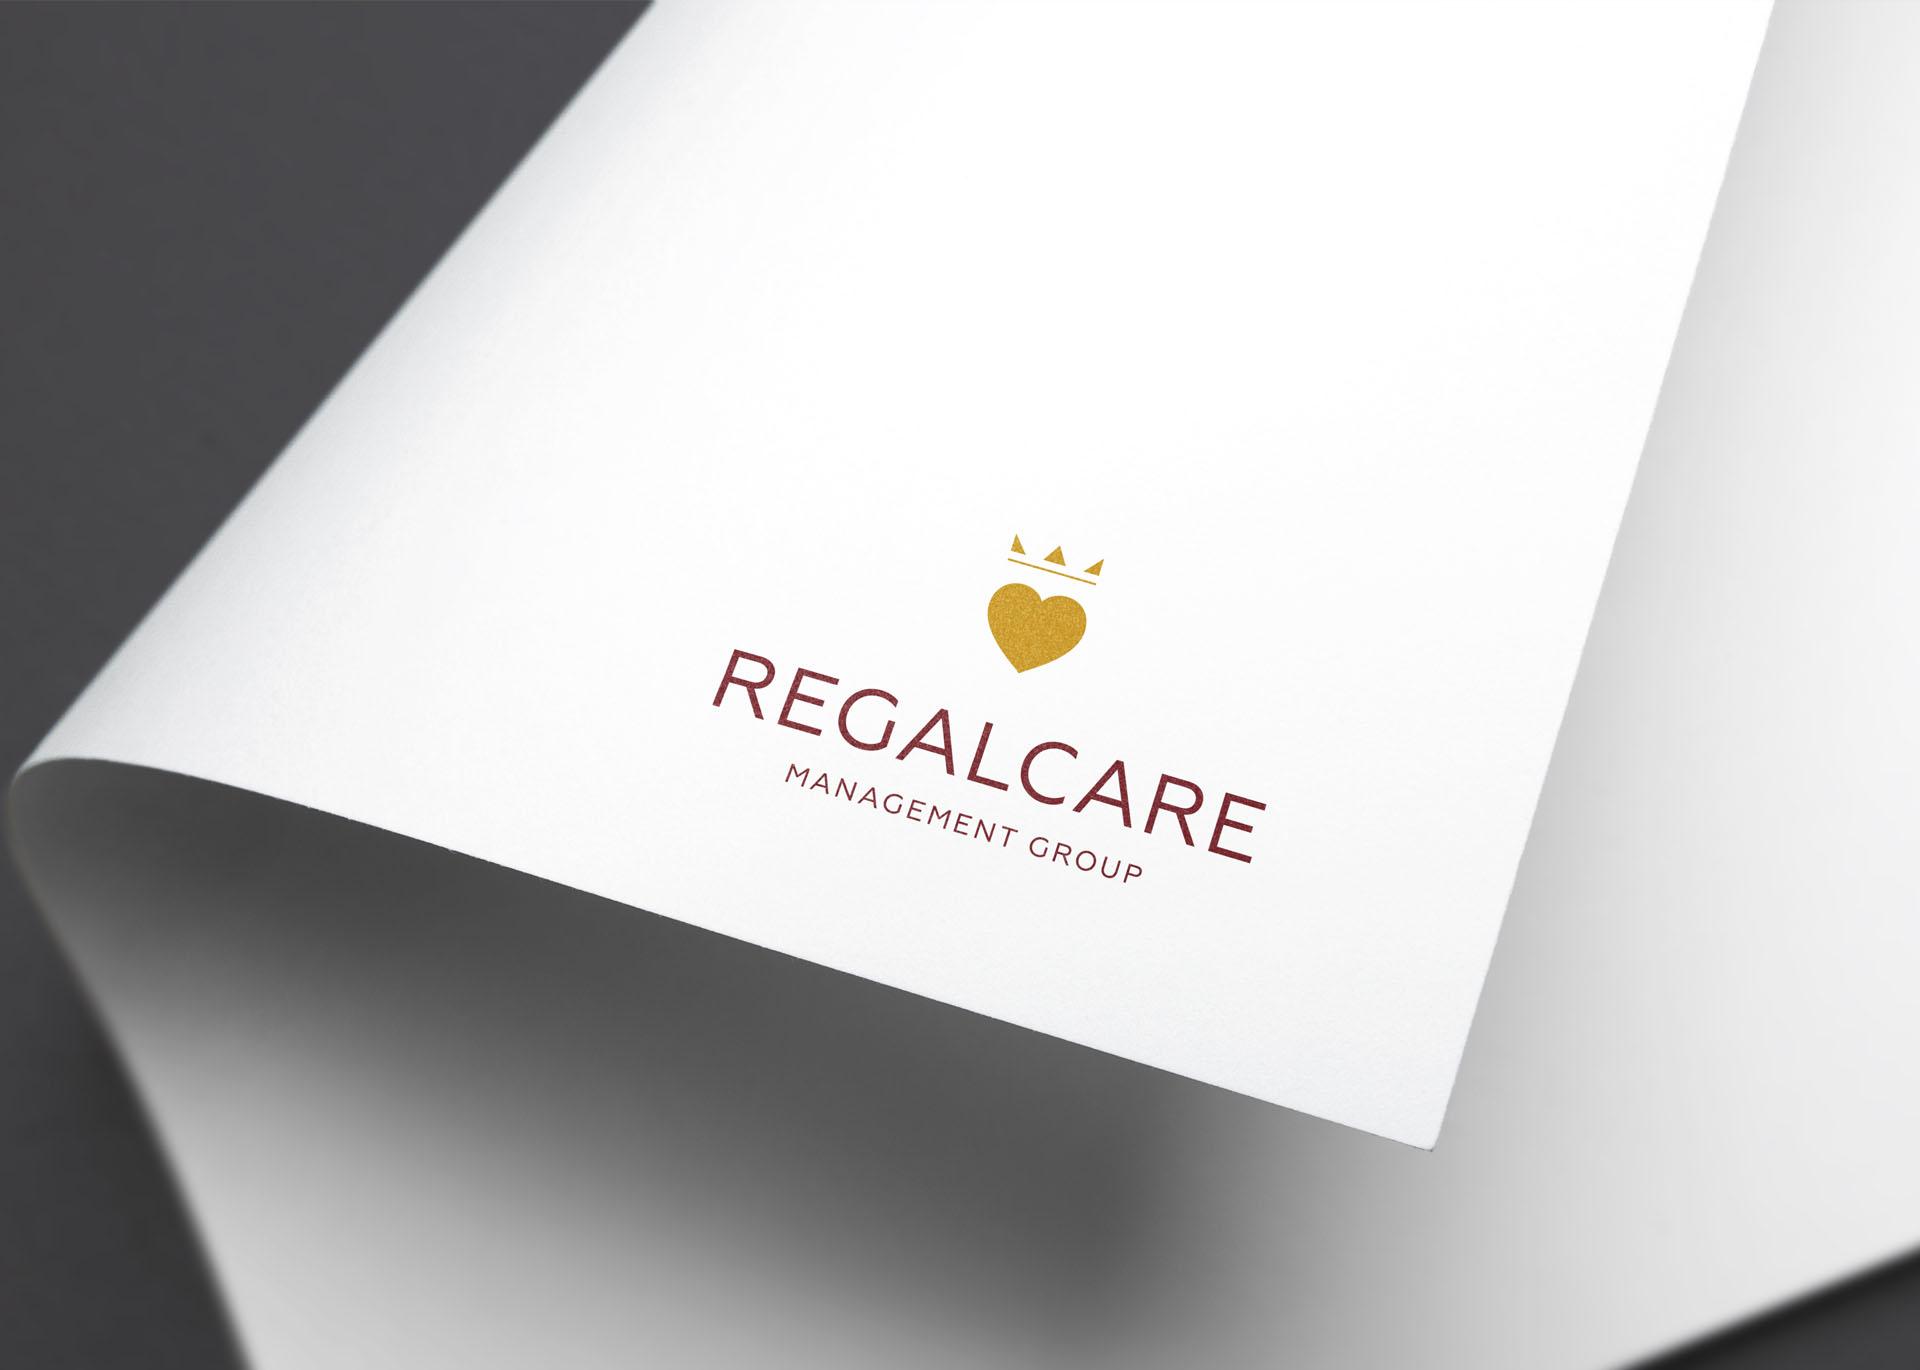 RegalCare Management Group